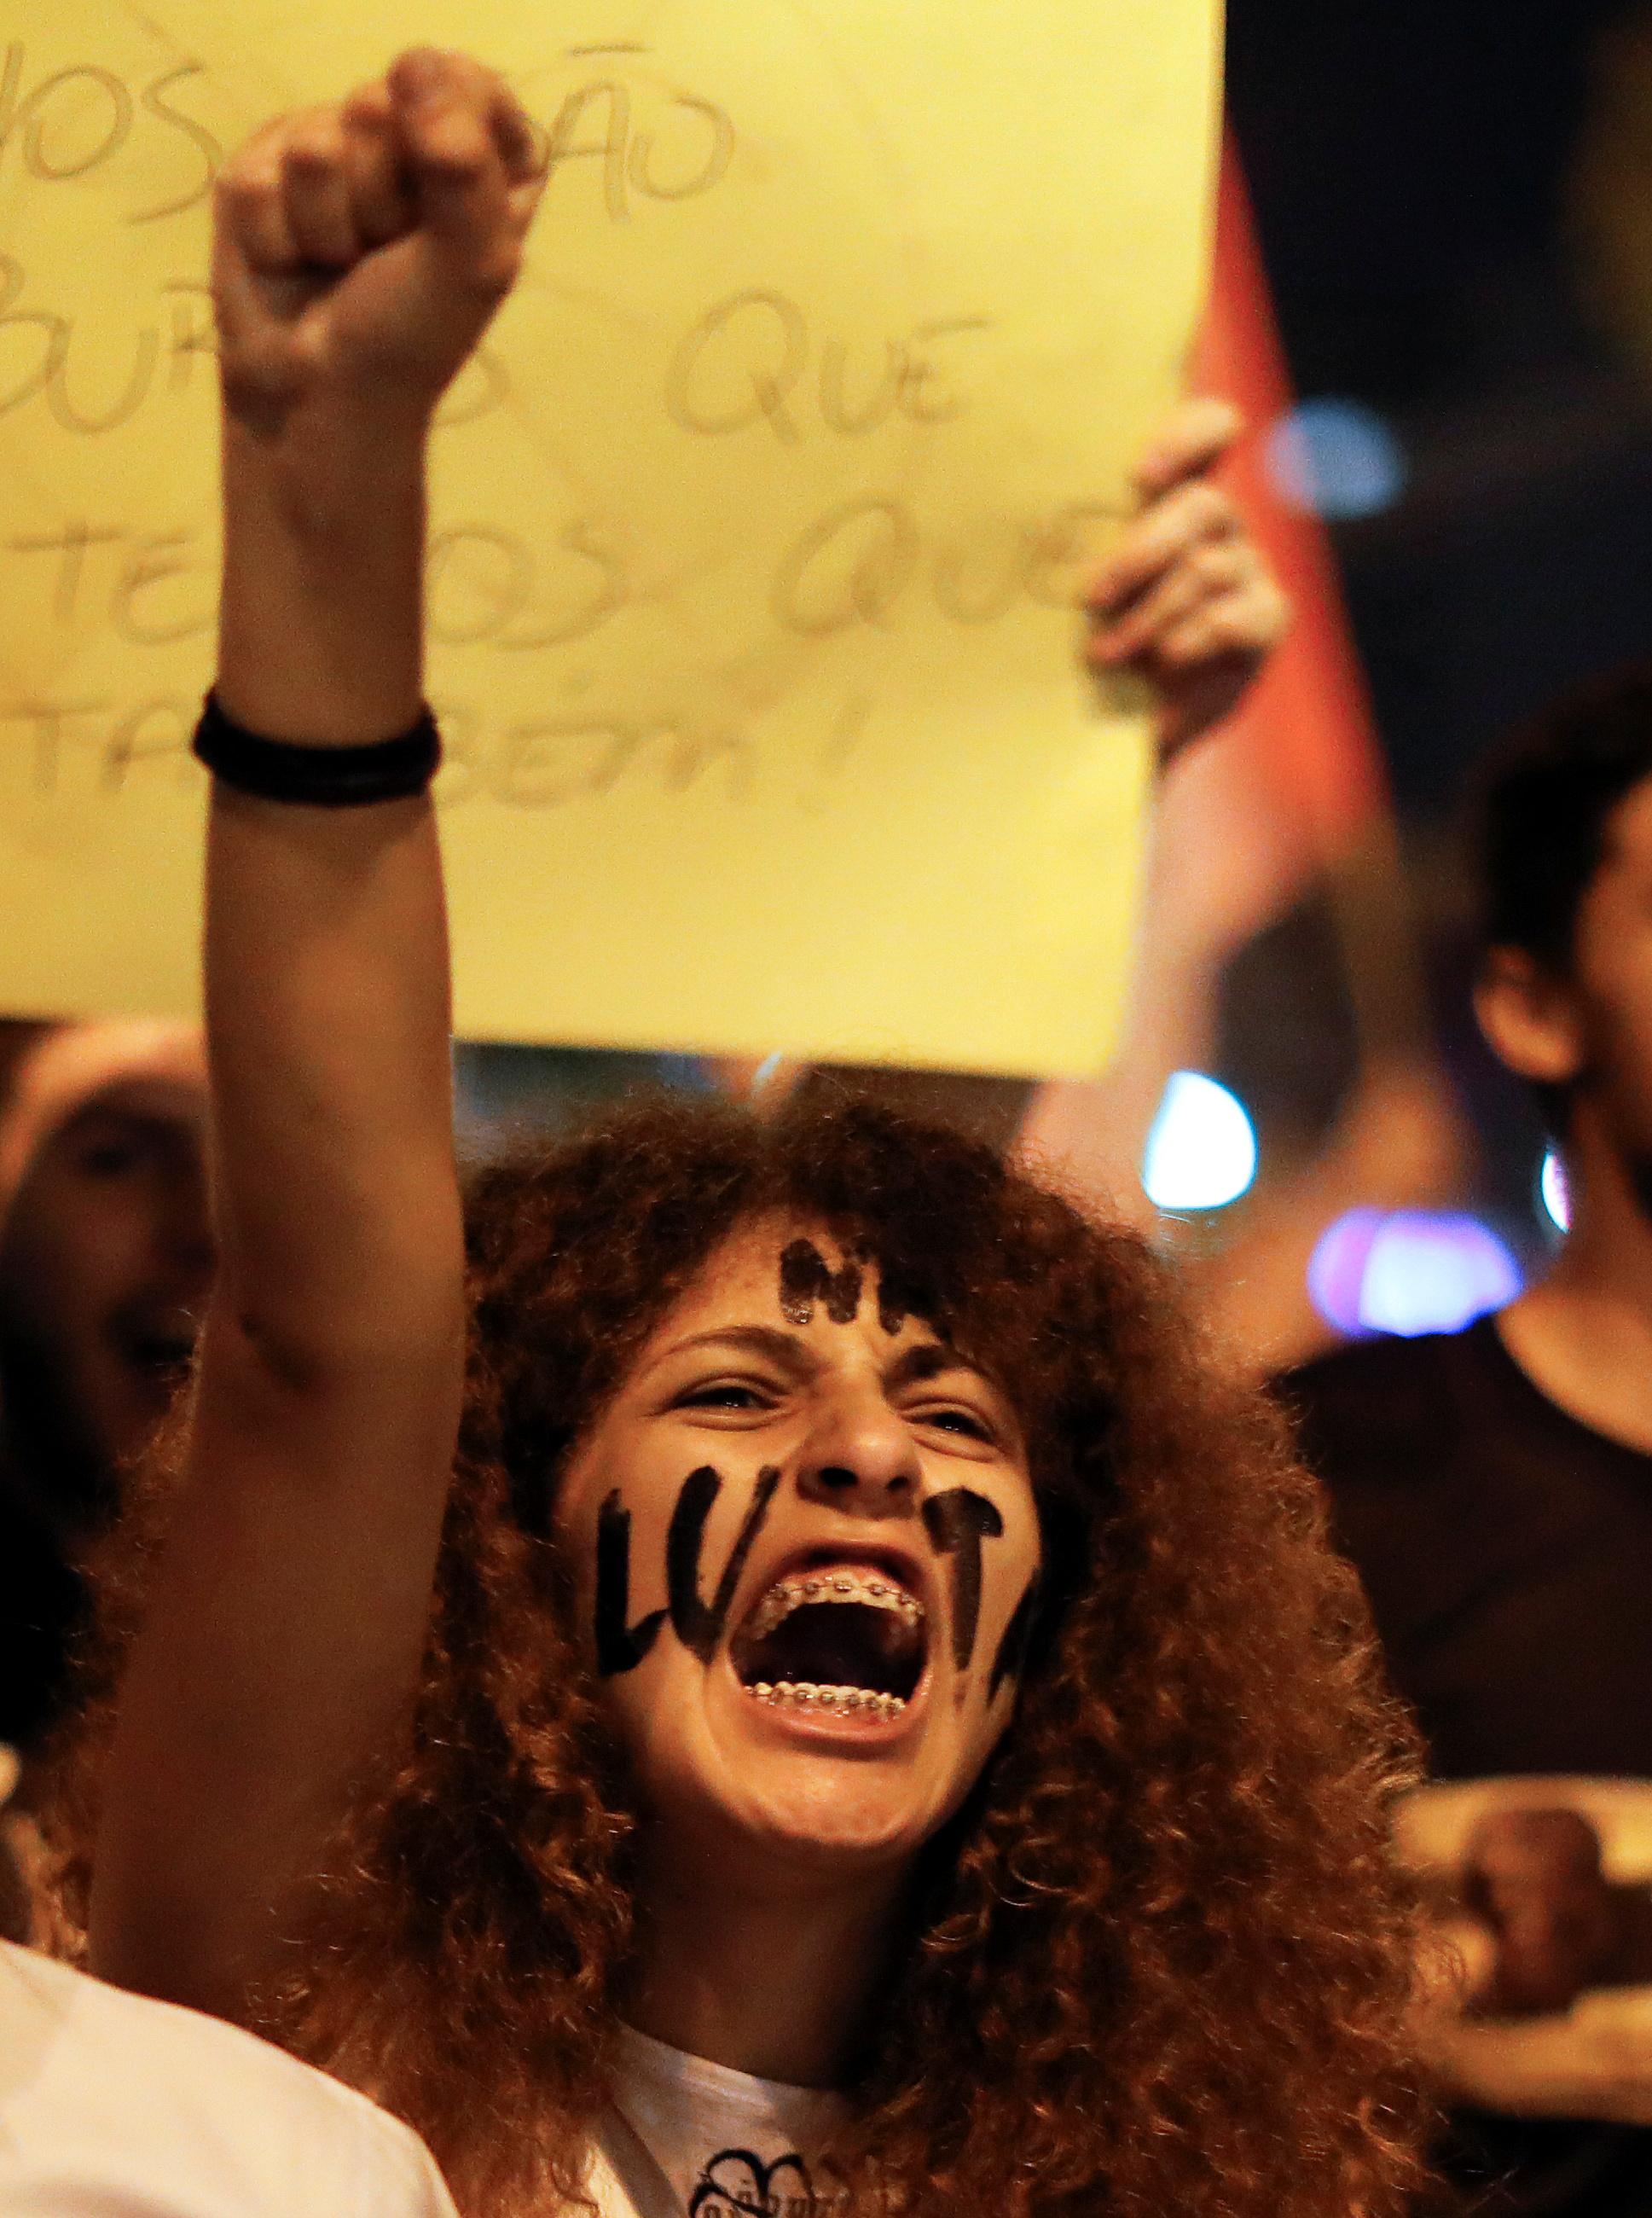 2019-05-10T225433Z_1459168883_RC13140B0330_RTRMADP_3_BRAZIL-POLITICS-PROTEST